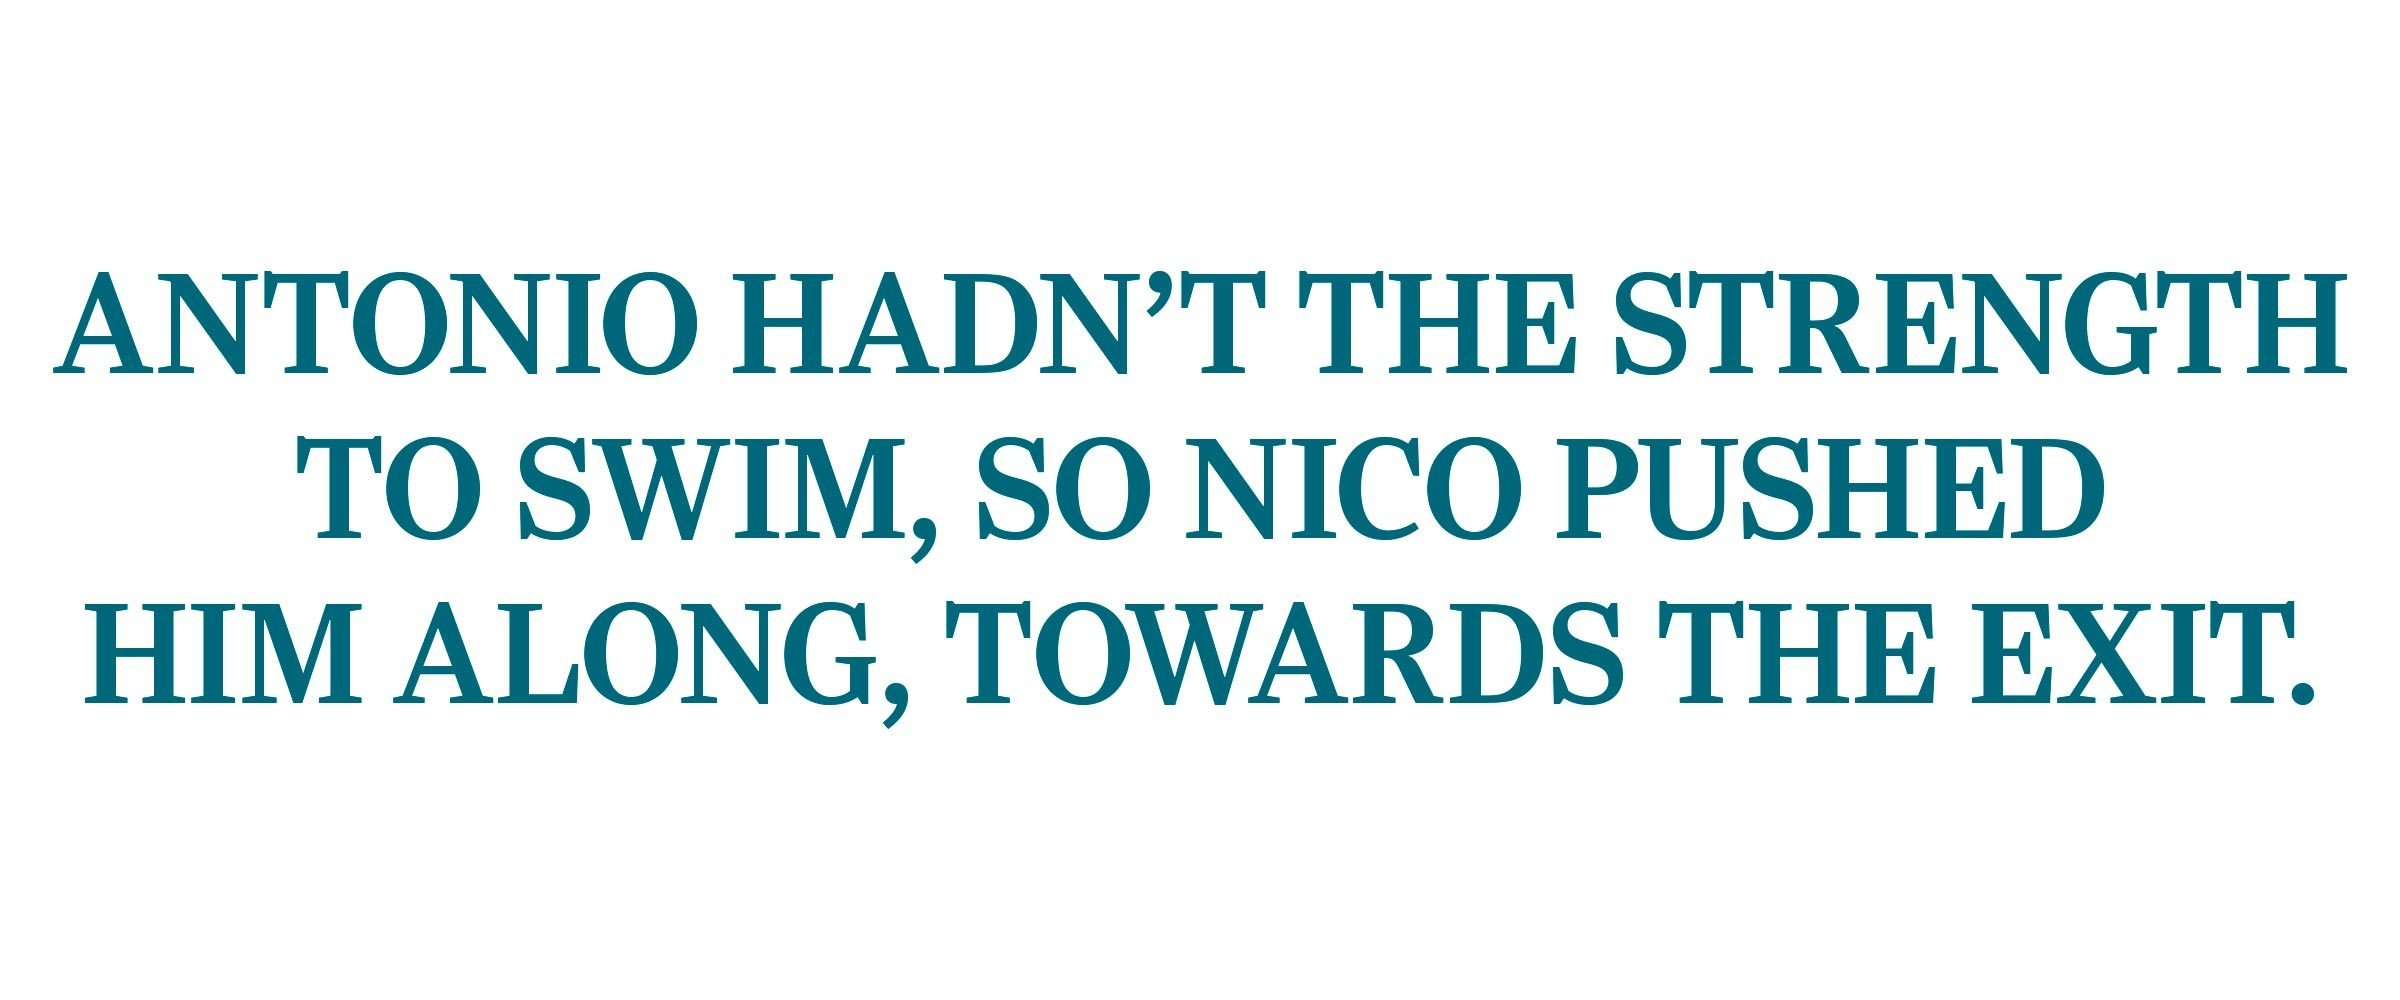 """Antonio hadn't the strength to swim, so nico pushed him along, towards the exit."""